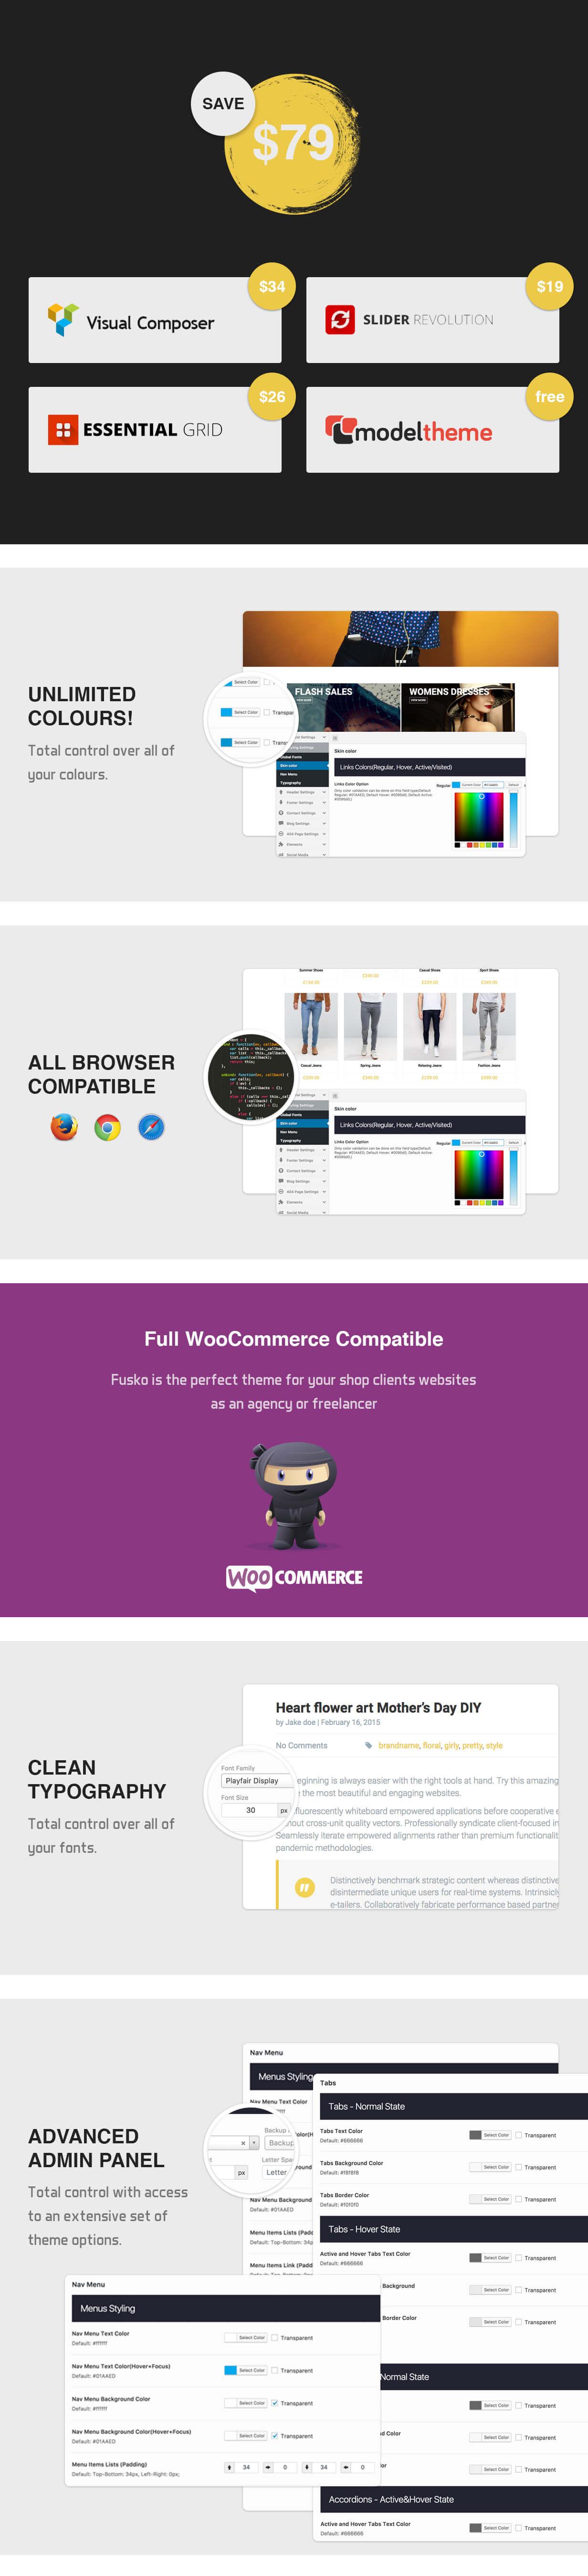 Fusko - Tech/Gadgets WooCommerce WordPress Theme - 6